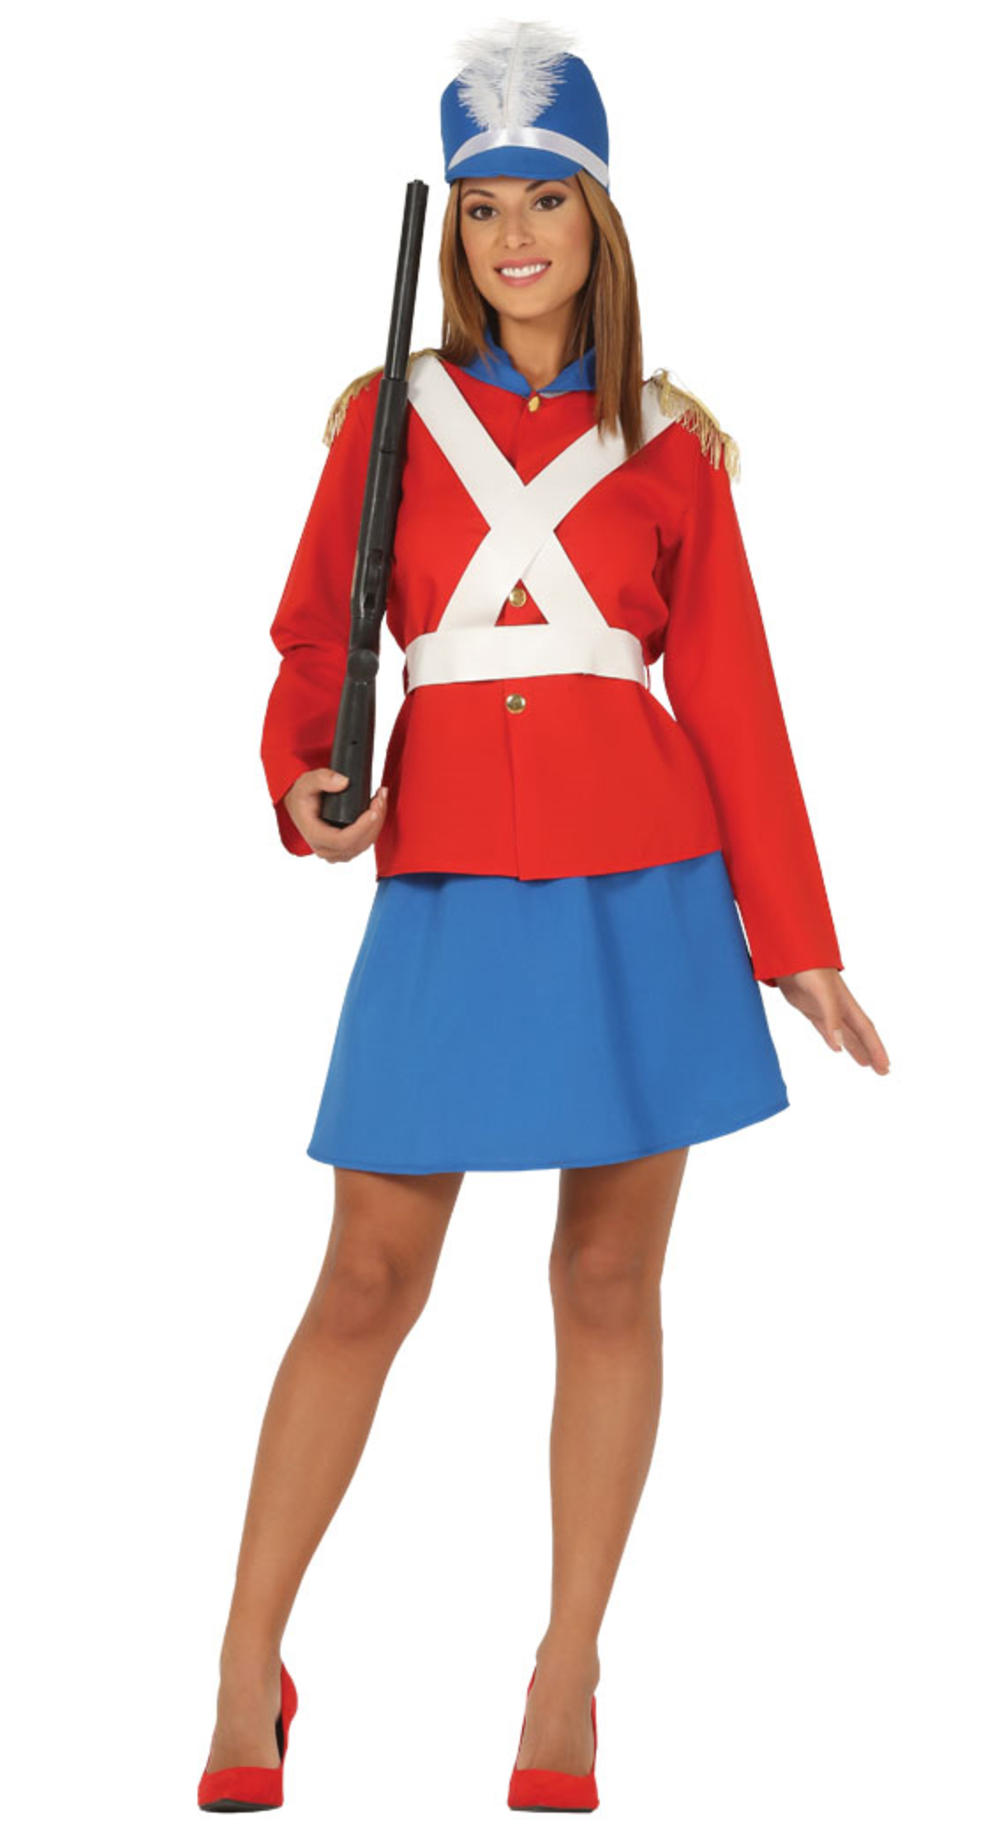 Toy Soldier Ladies Fancy Dress Majorette Nutcracker Adults Womens Costume Outfit